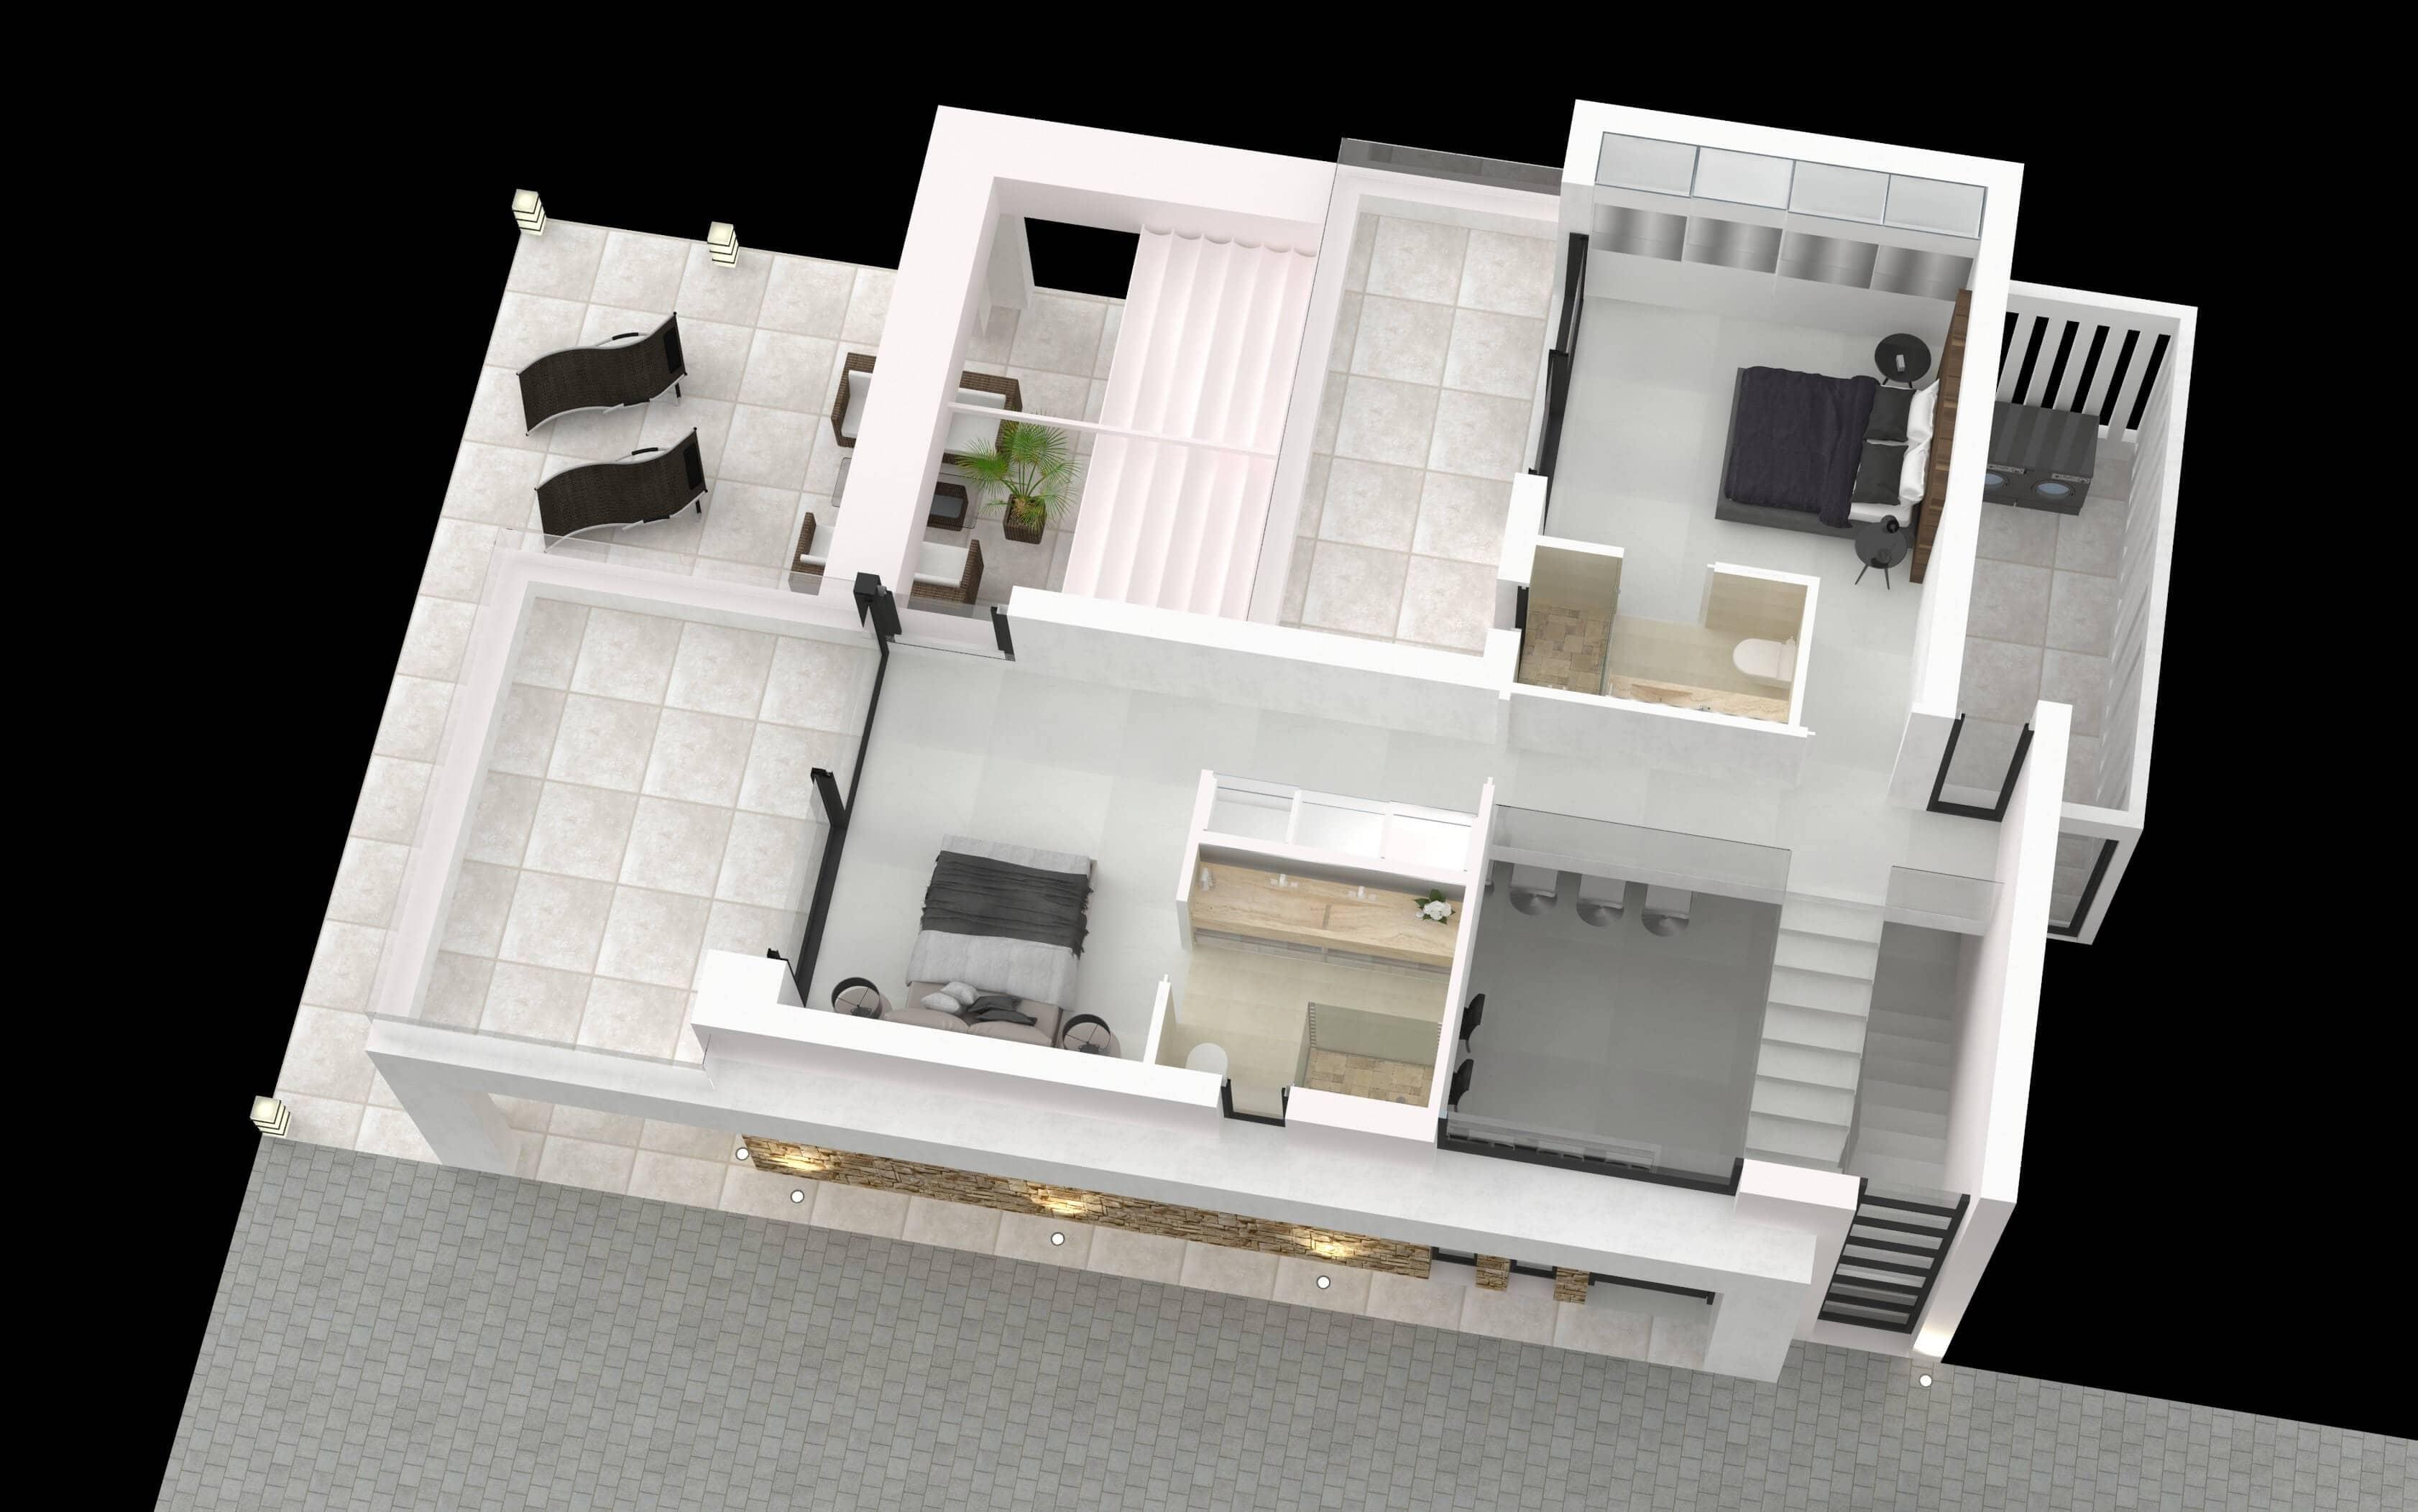 buena vista hills villas te koop B plan verdieping